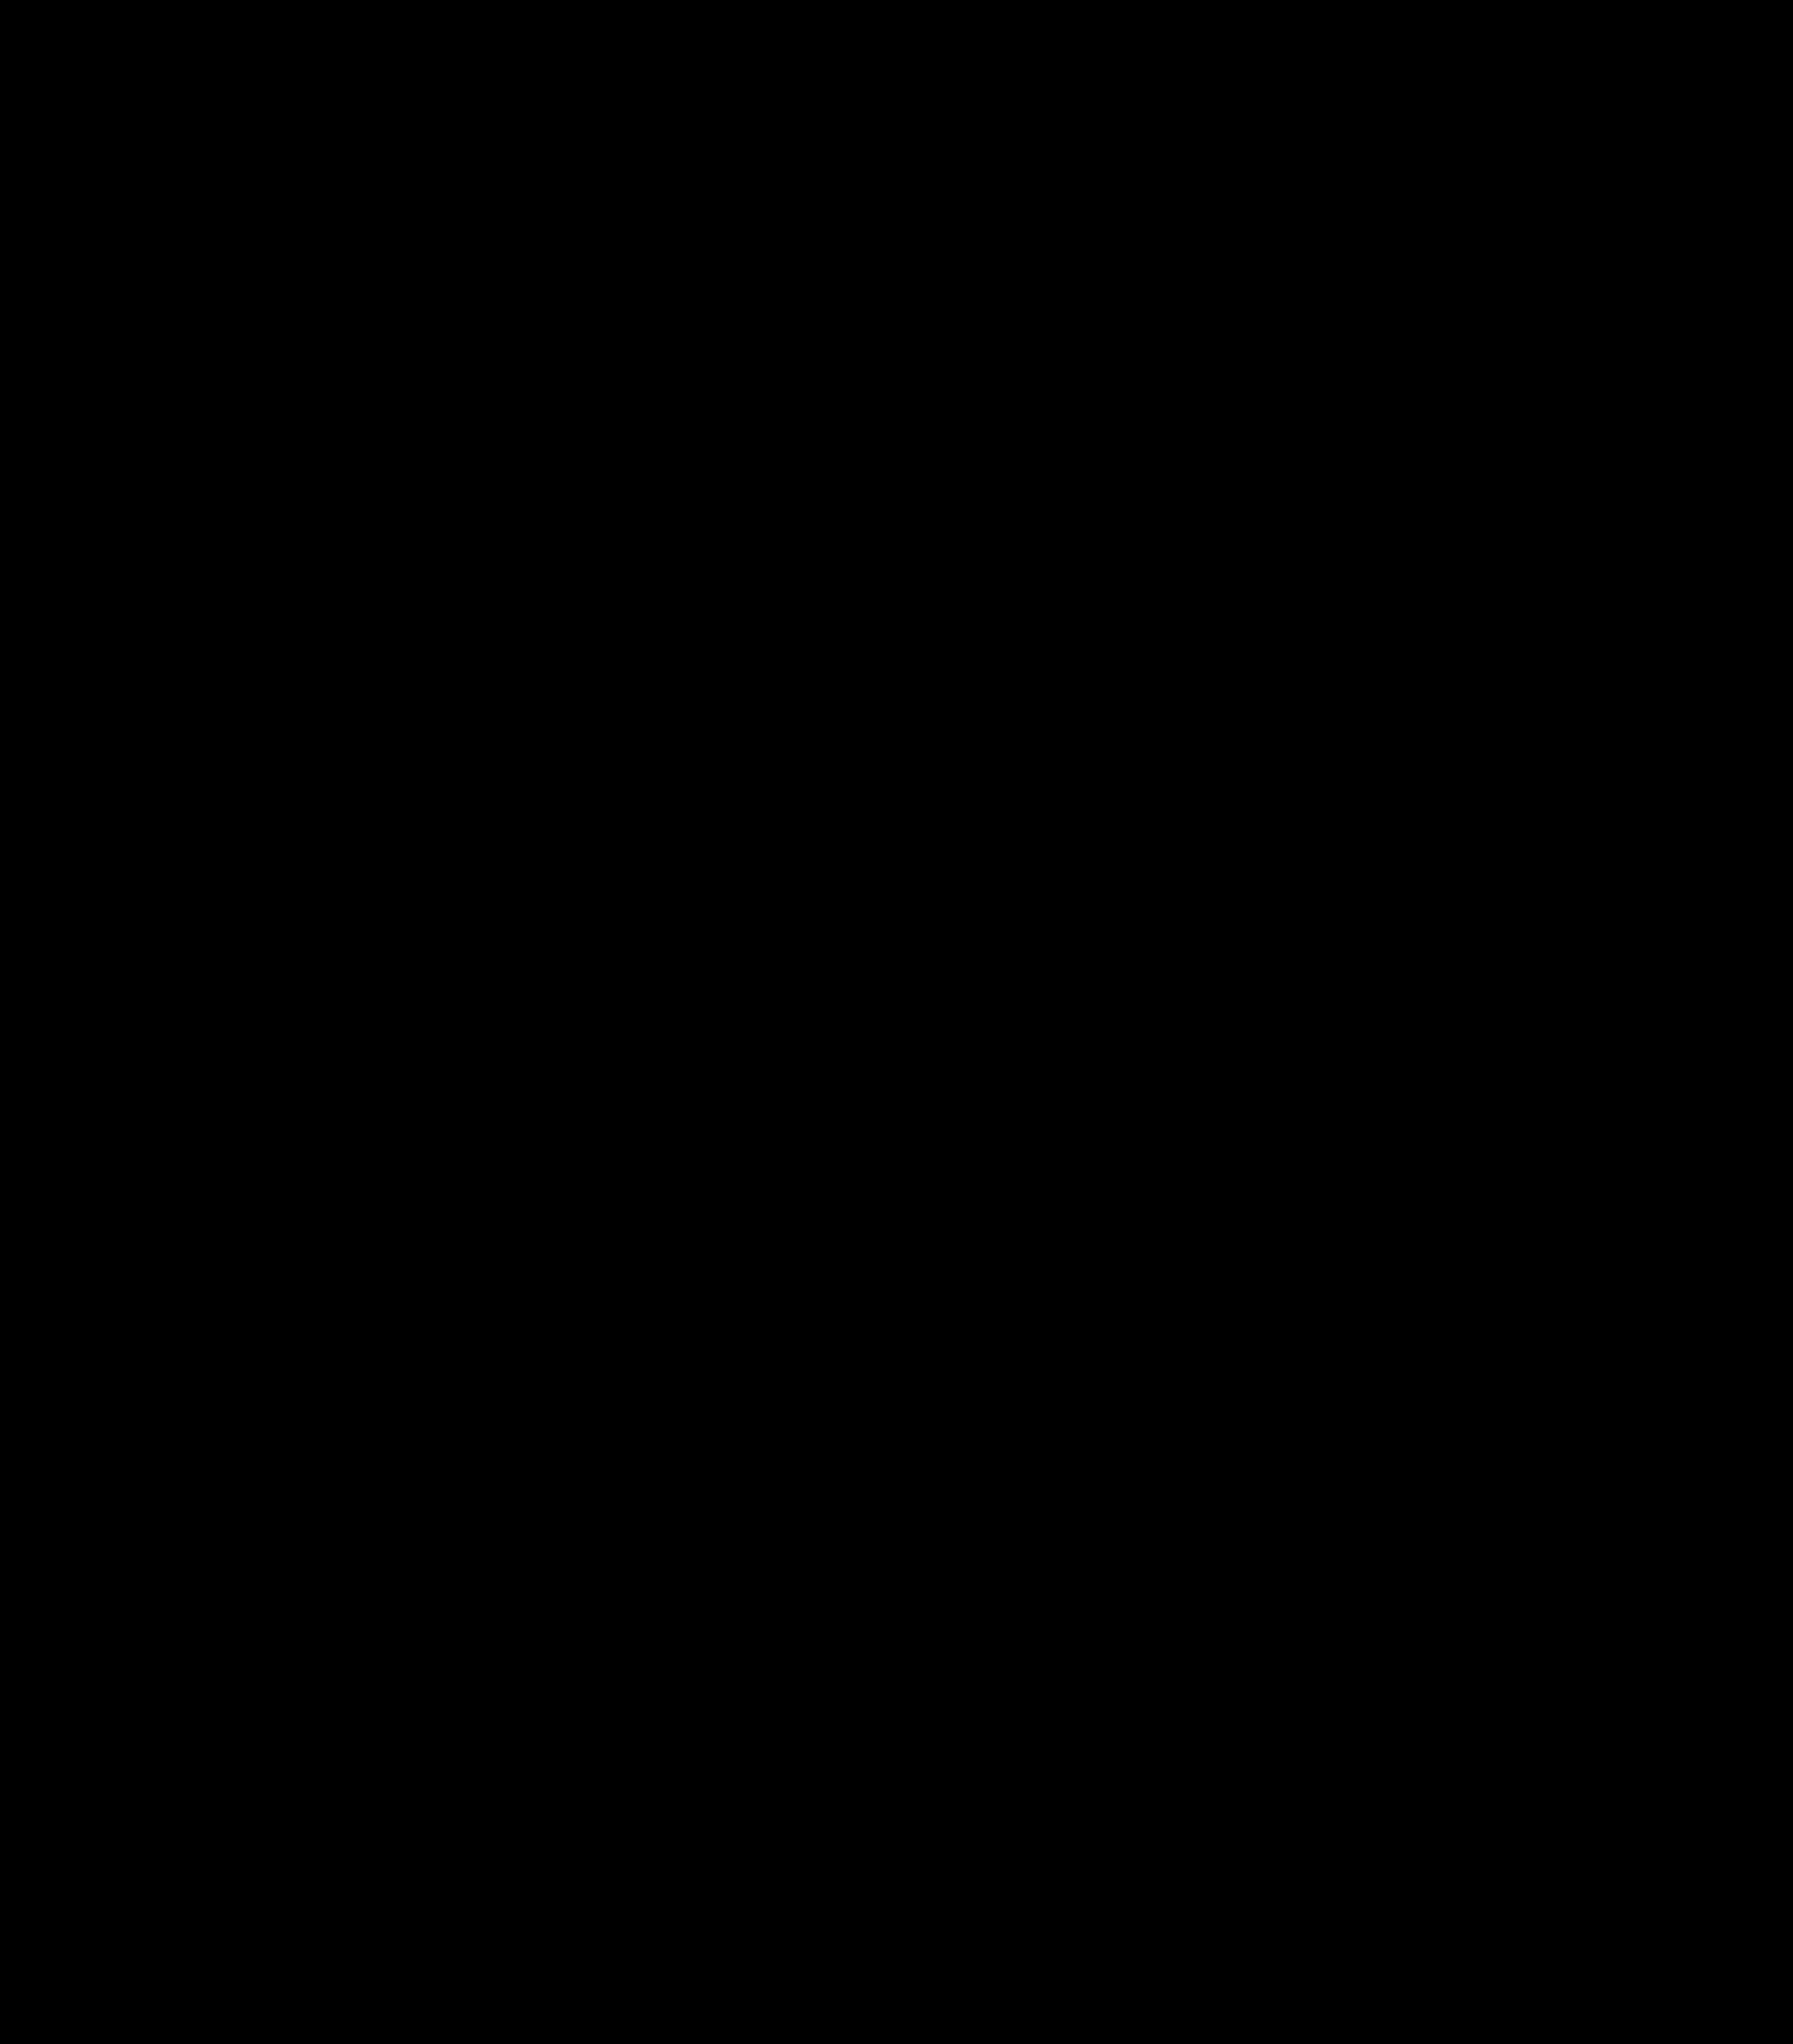 2105x2400 Scroll Clipart